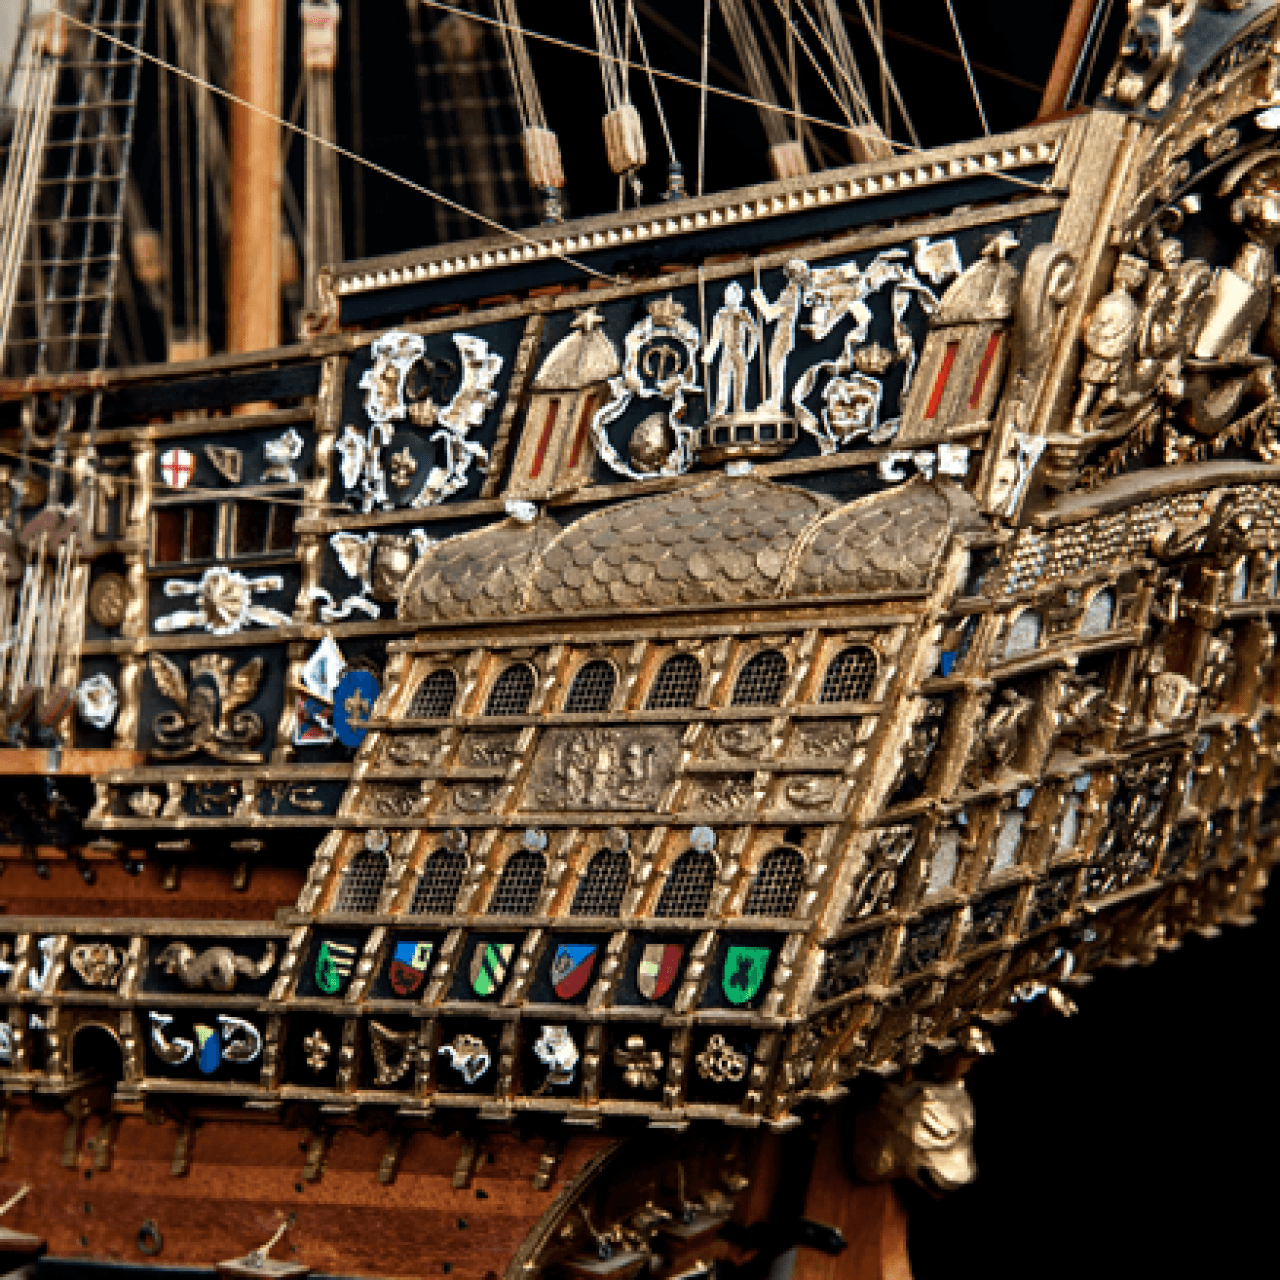 HMS Sovereign of the Seas | 1:84 Model